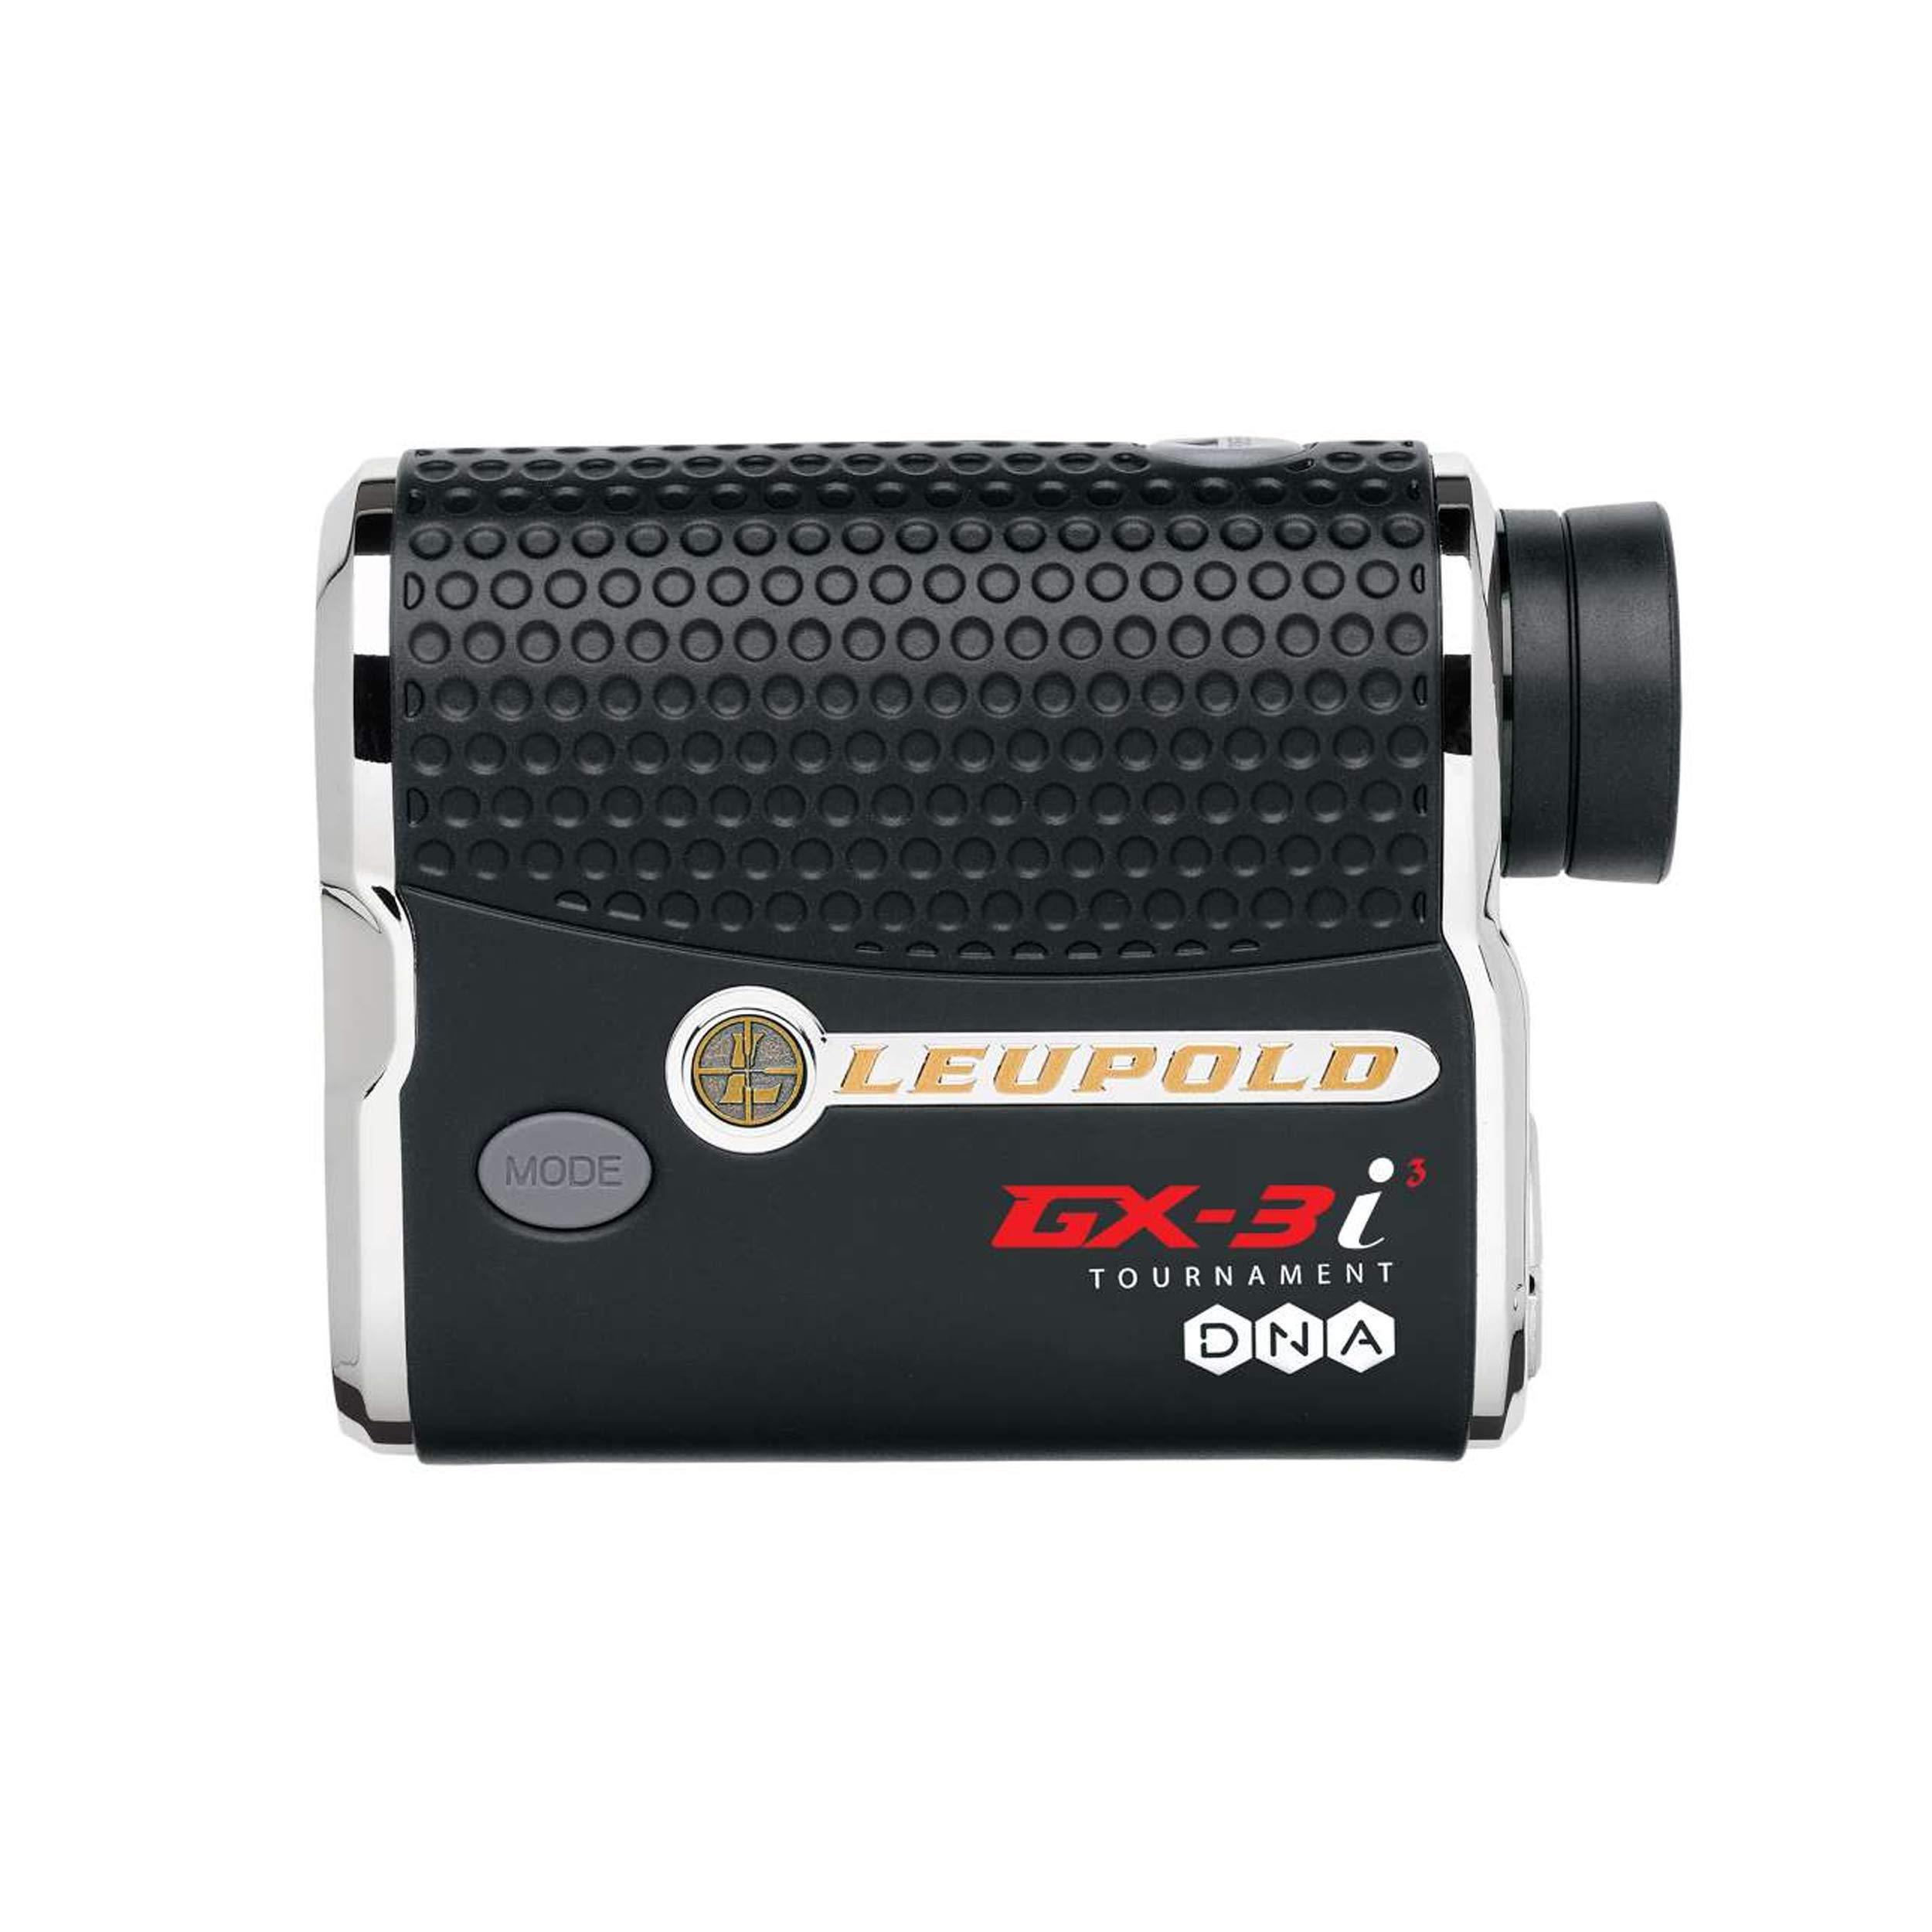 Leupold GX 3i3 Gx 3I3 Rangefinder Black